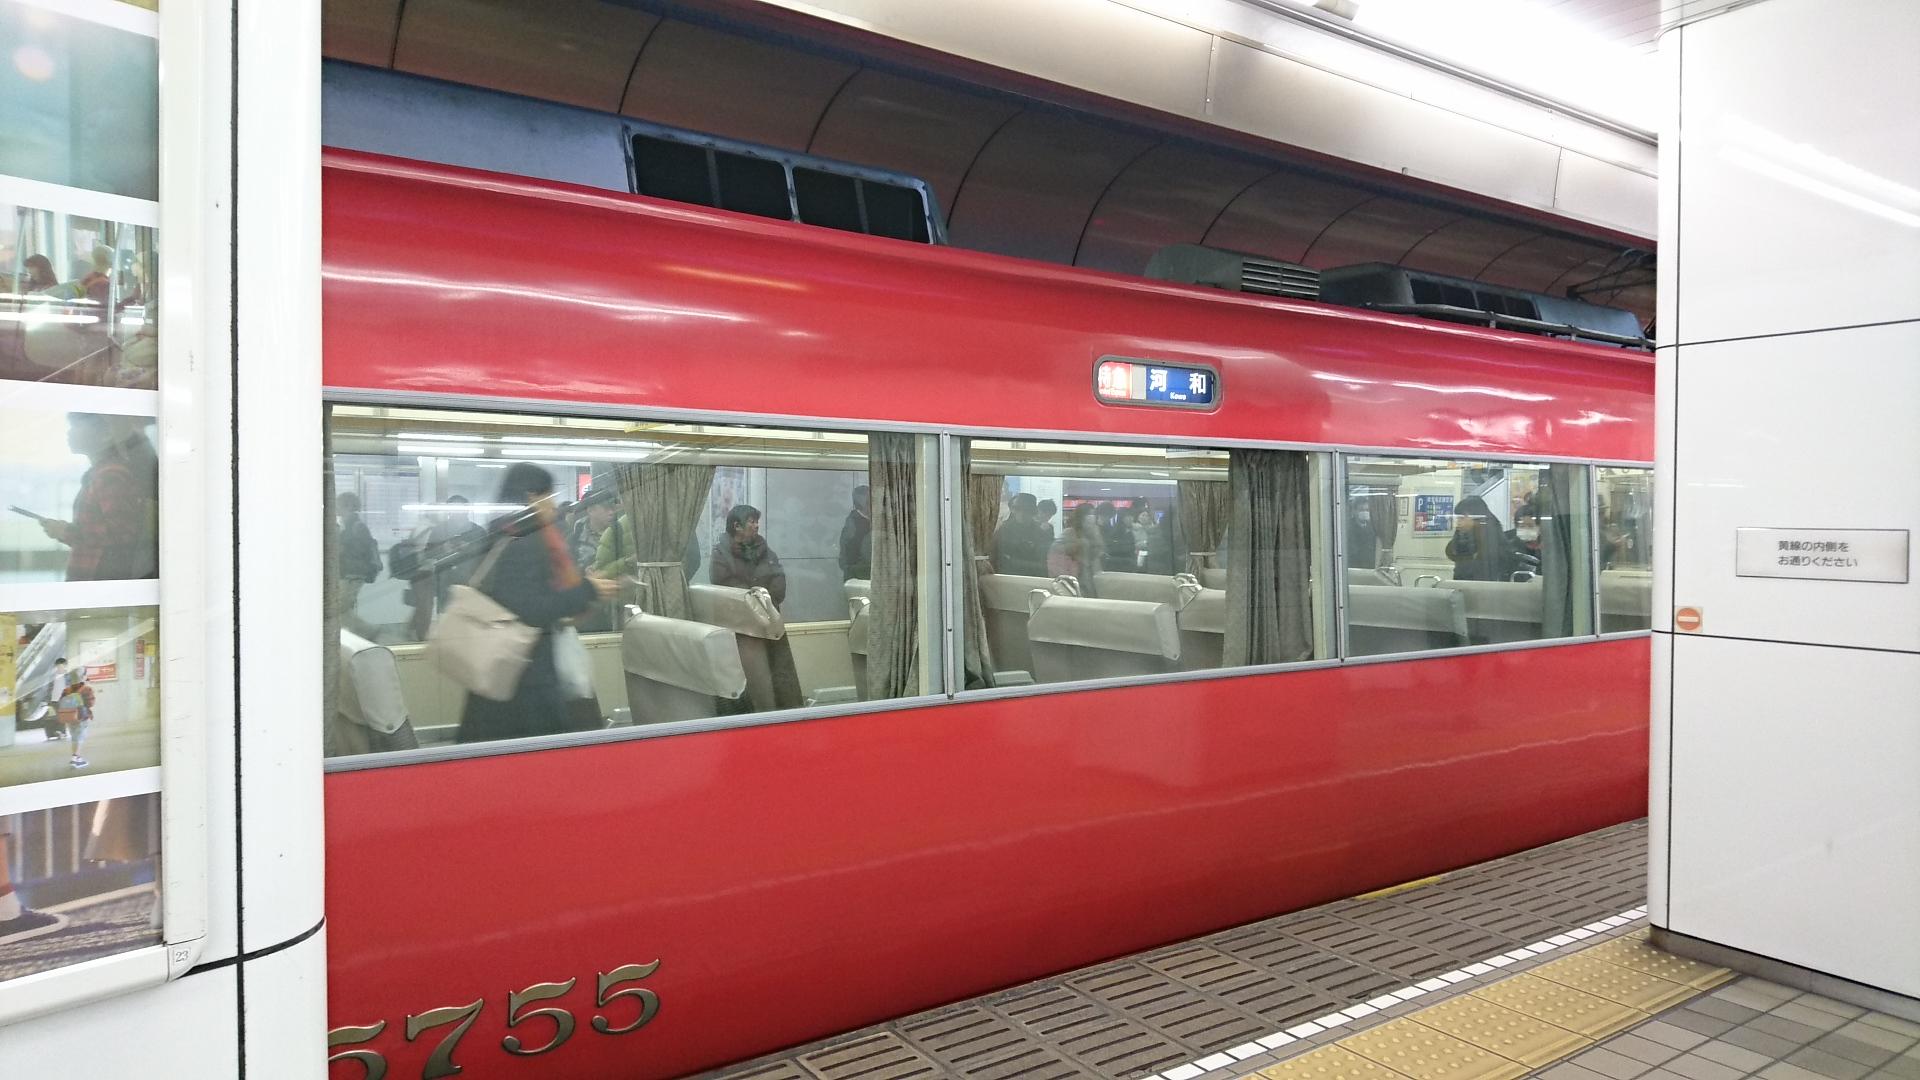 2017.12.14 名古屋 (17) 名古屋 - 河和いき特急 1920-1080